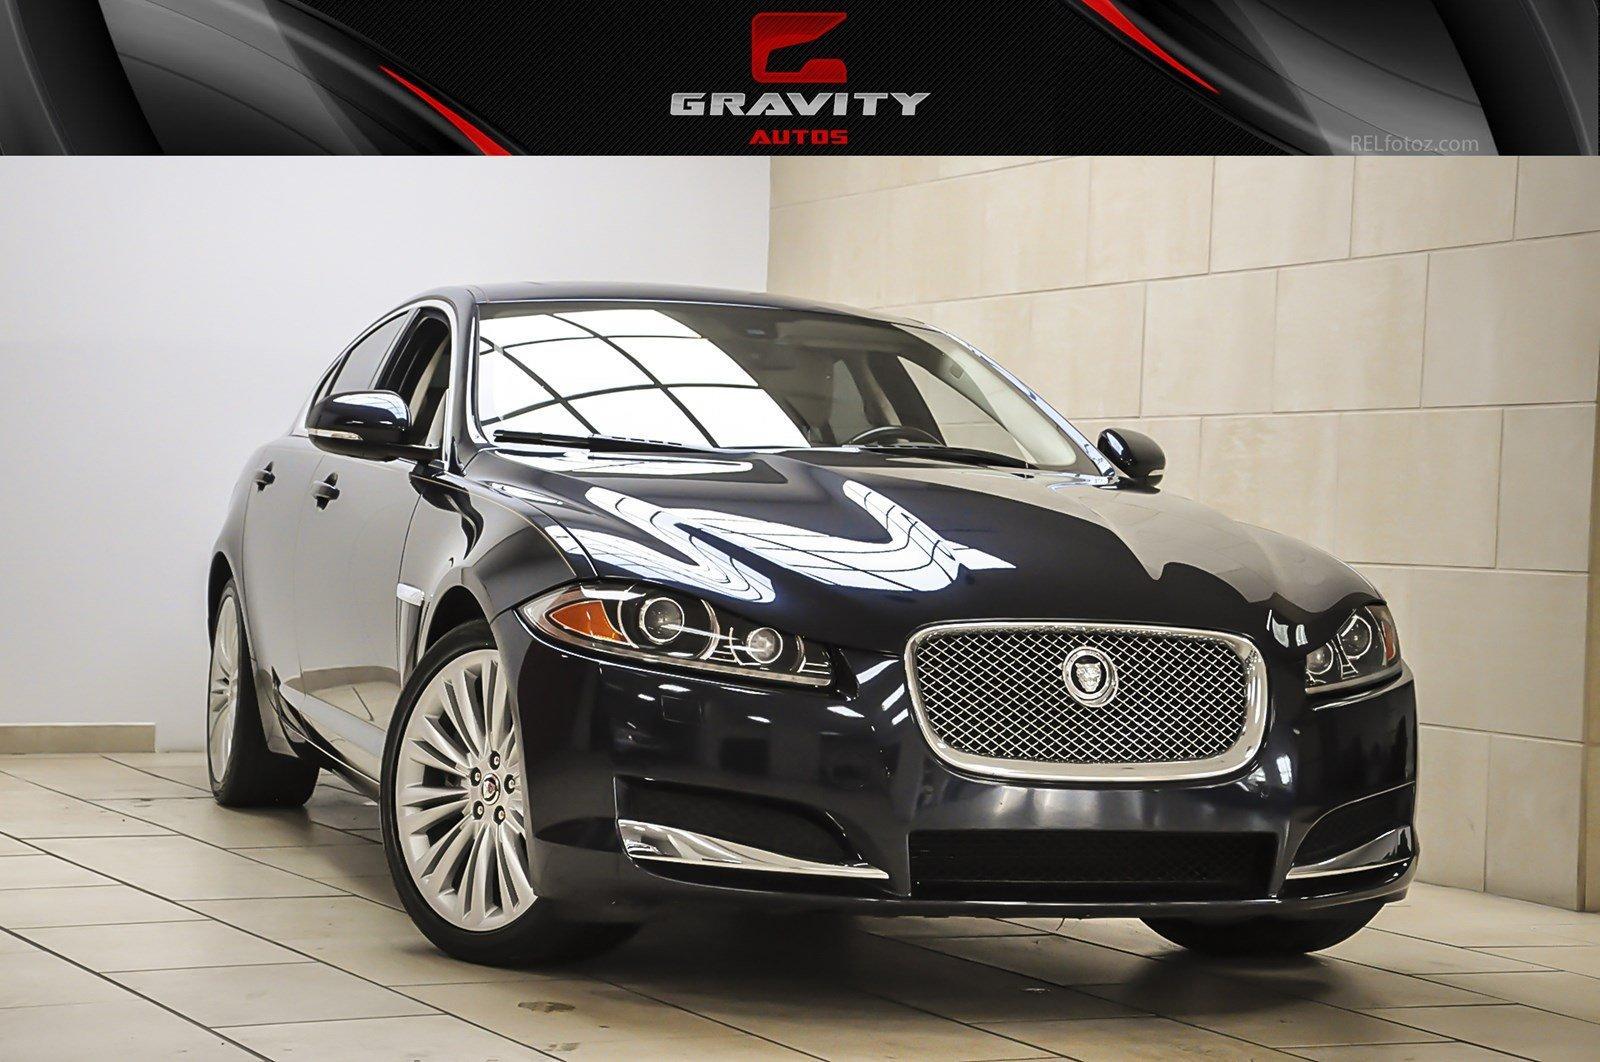 cars stop classifieds jaguar bucks sat leather r in pistonheads sunroof full d black xf auto nav sport sale for start used